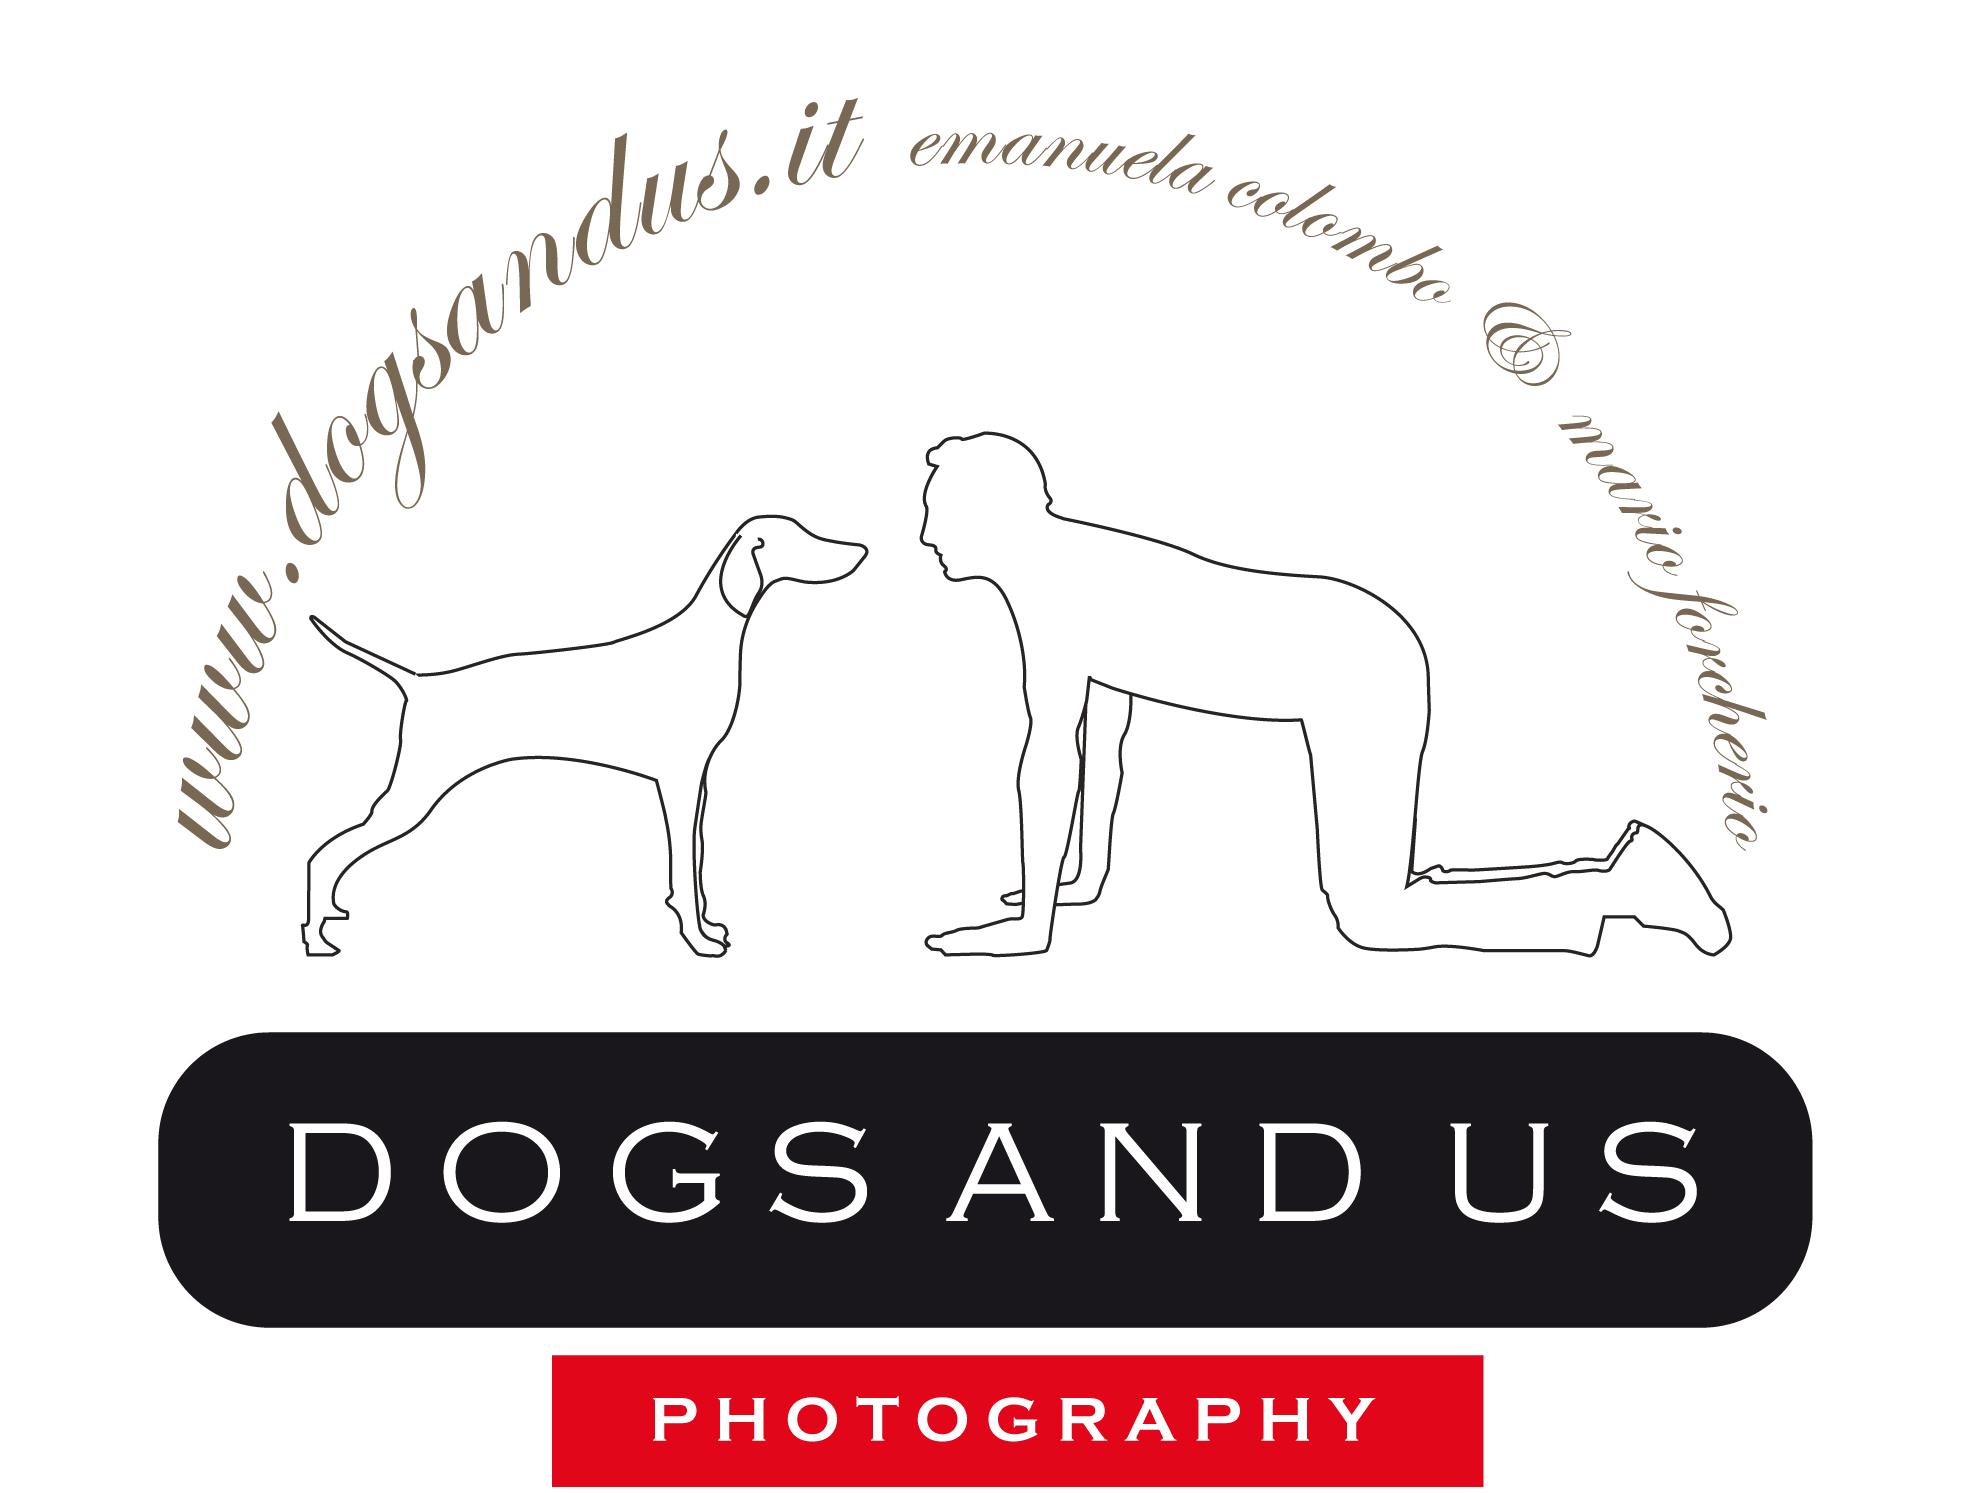 dogsandus